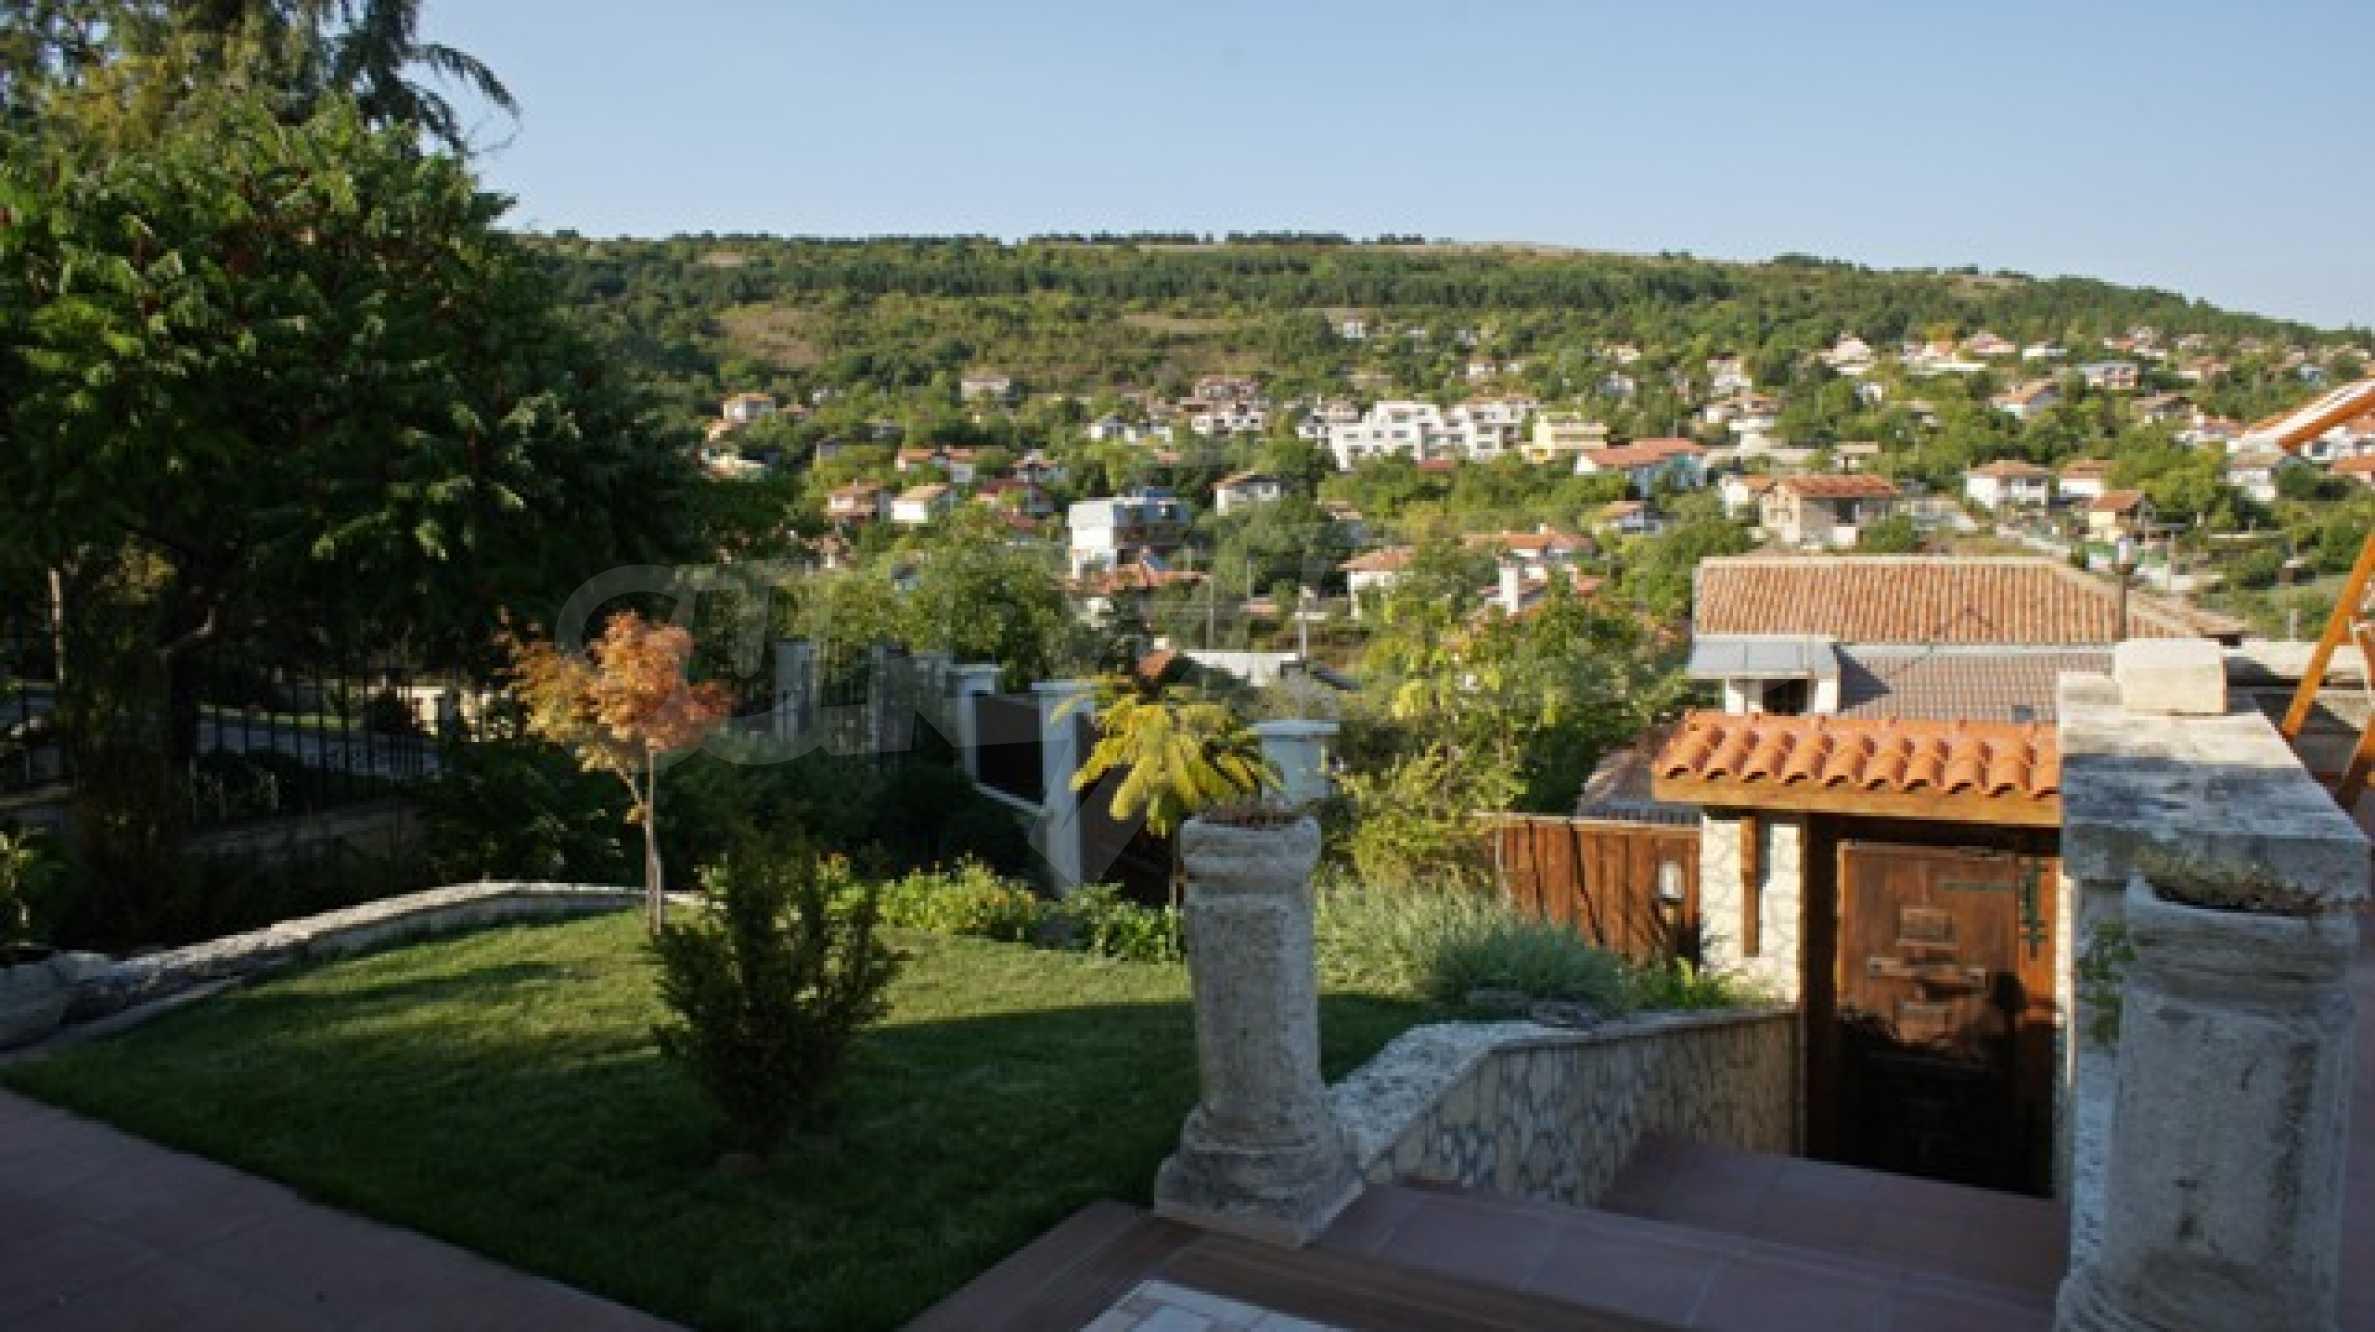 The Mediterranean style - a sense of luxury 16